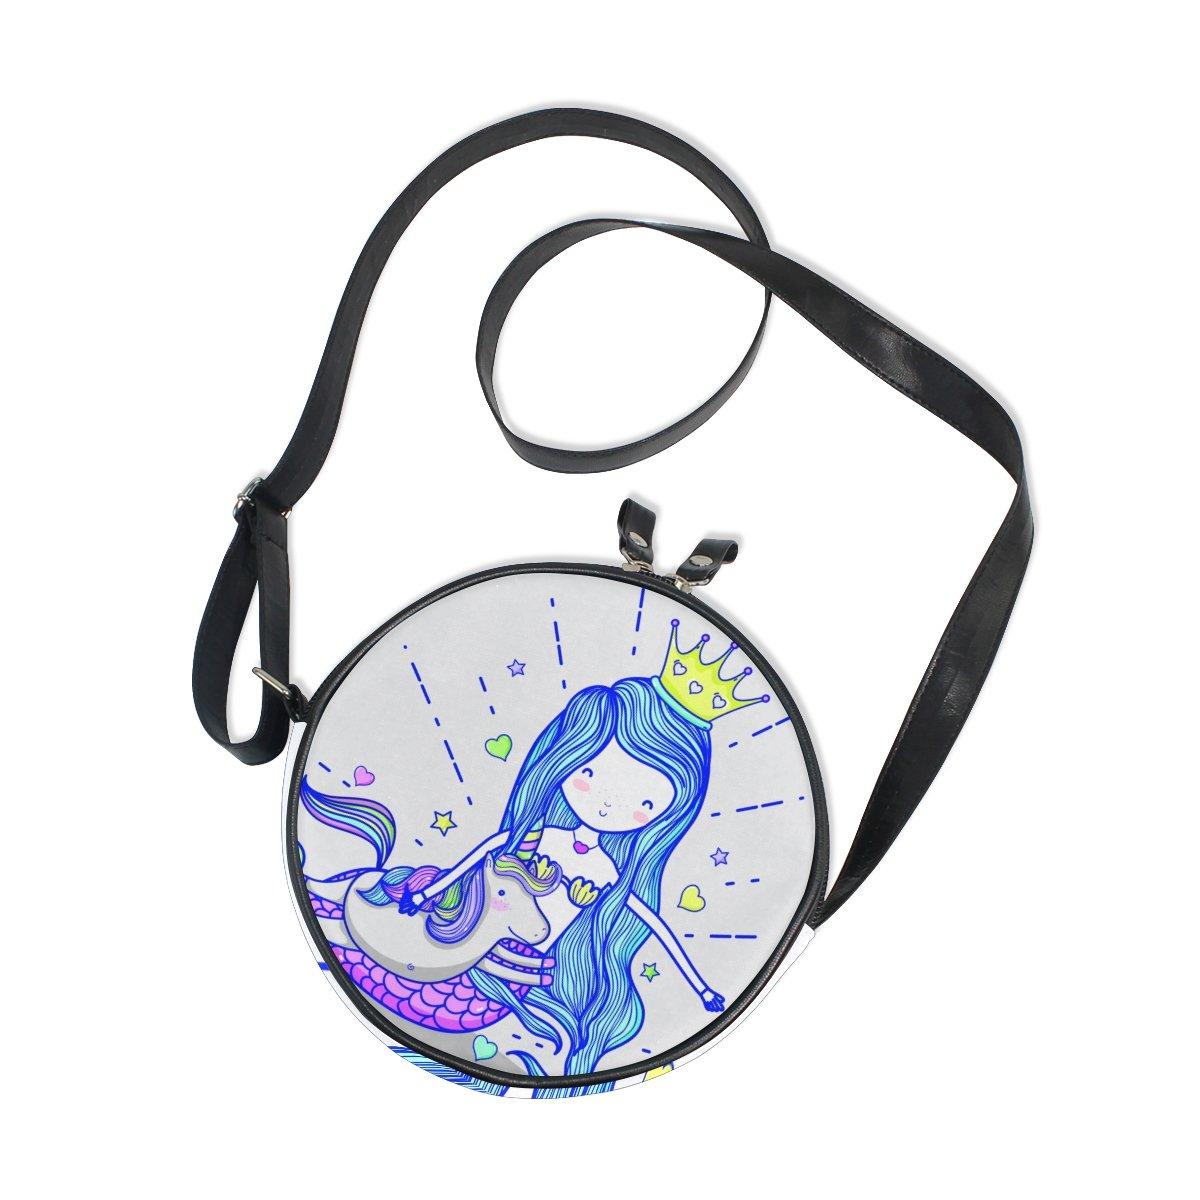 XinMing Mermaid Unicorn Girl Round Crossbody Shoulder Bags Adjustable Top Handle Bags Satchel for Women